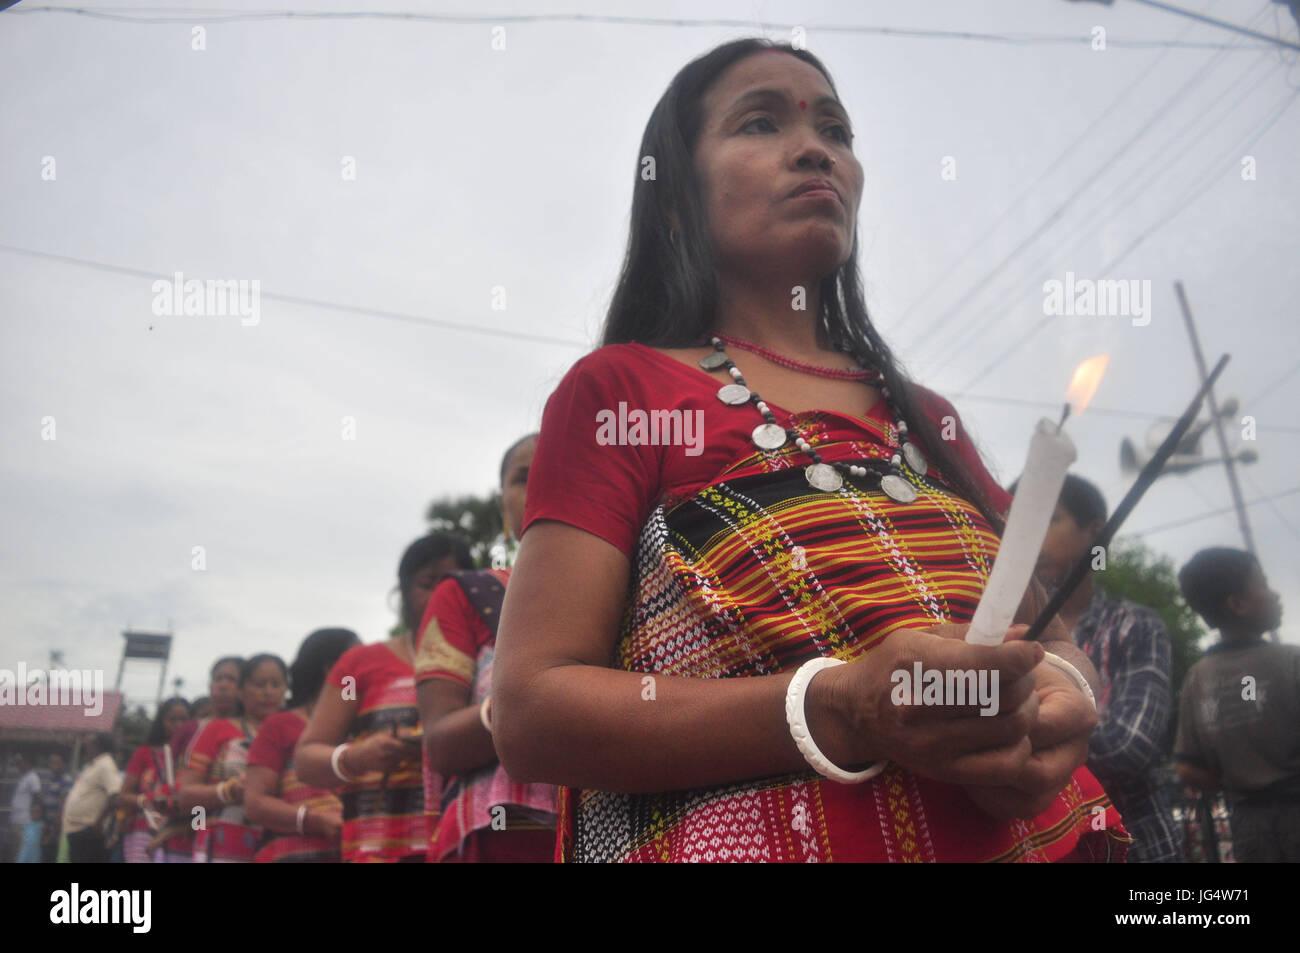 Abhisek Saha / Le Pictorium -  Kharchi Puja festival in India -  01/07/2017  -  India / Tripura / Agartala  -  Tribal Stock Photo